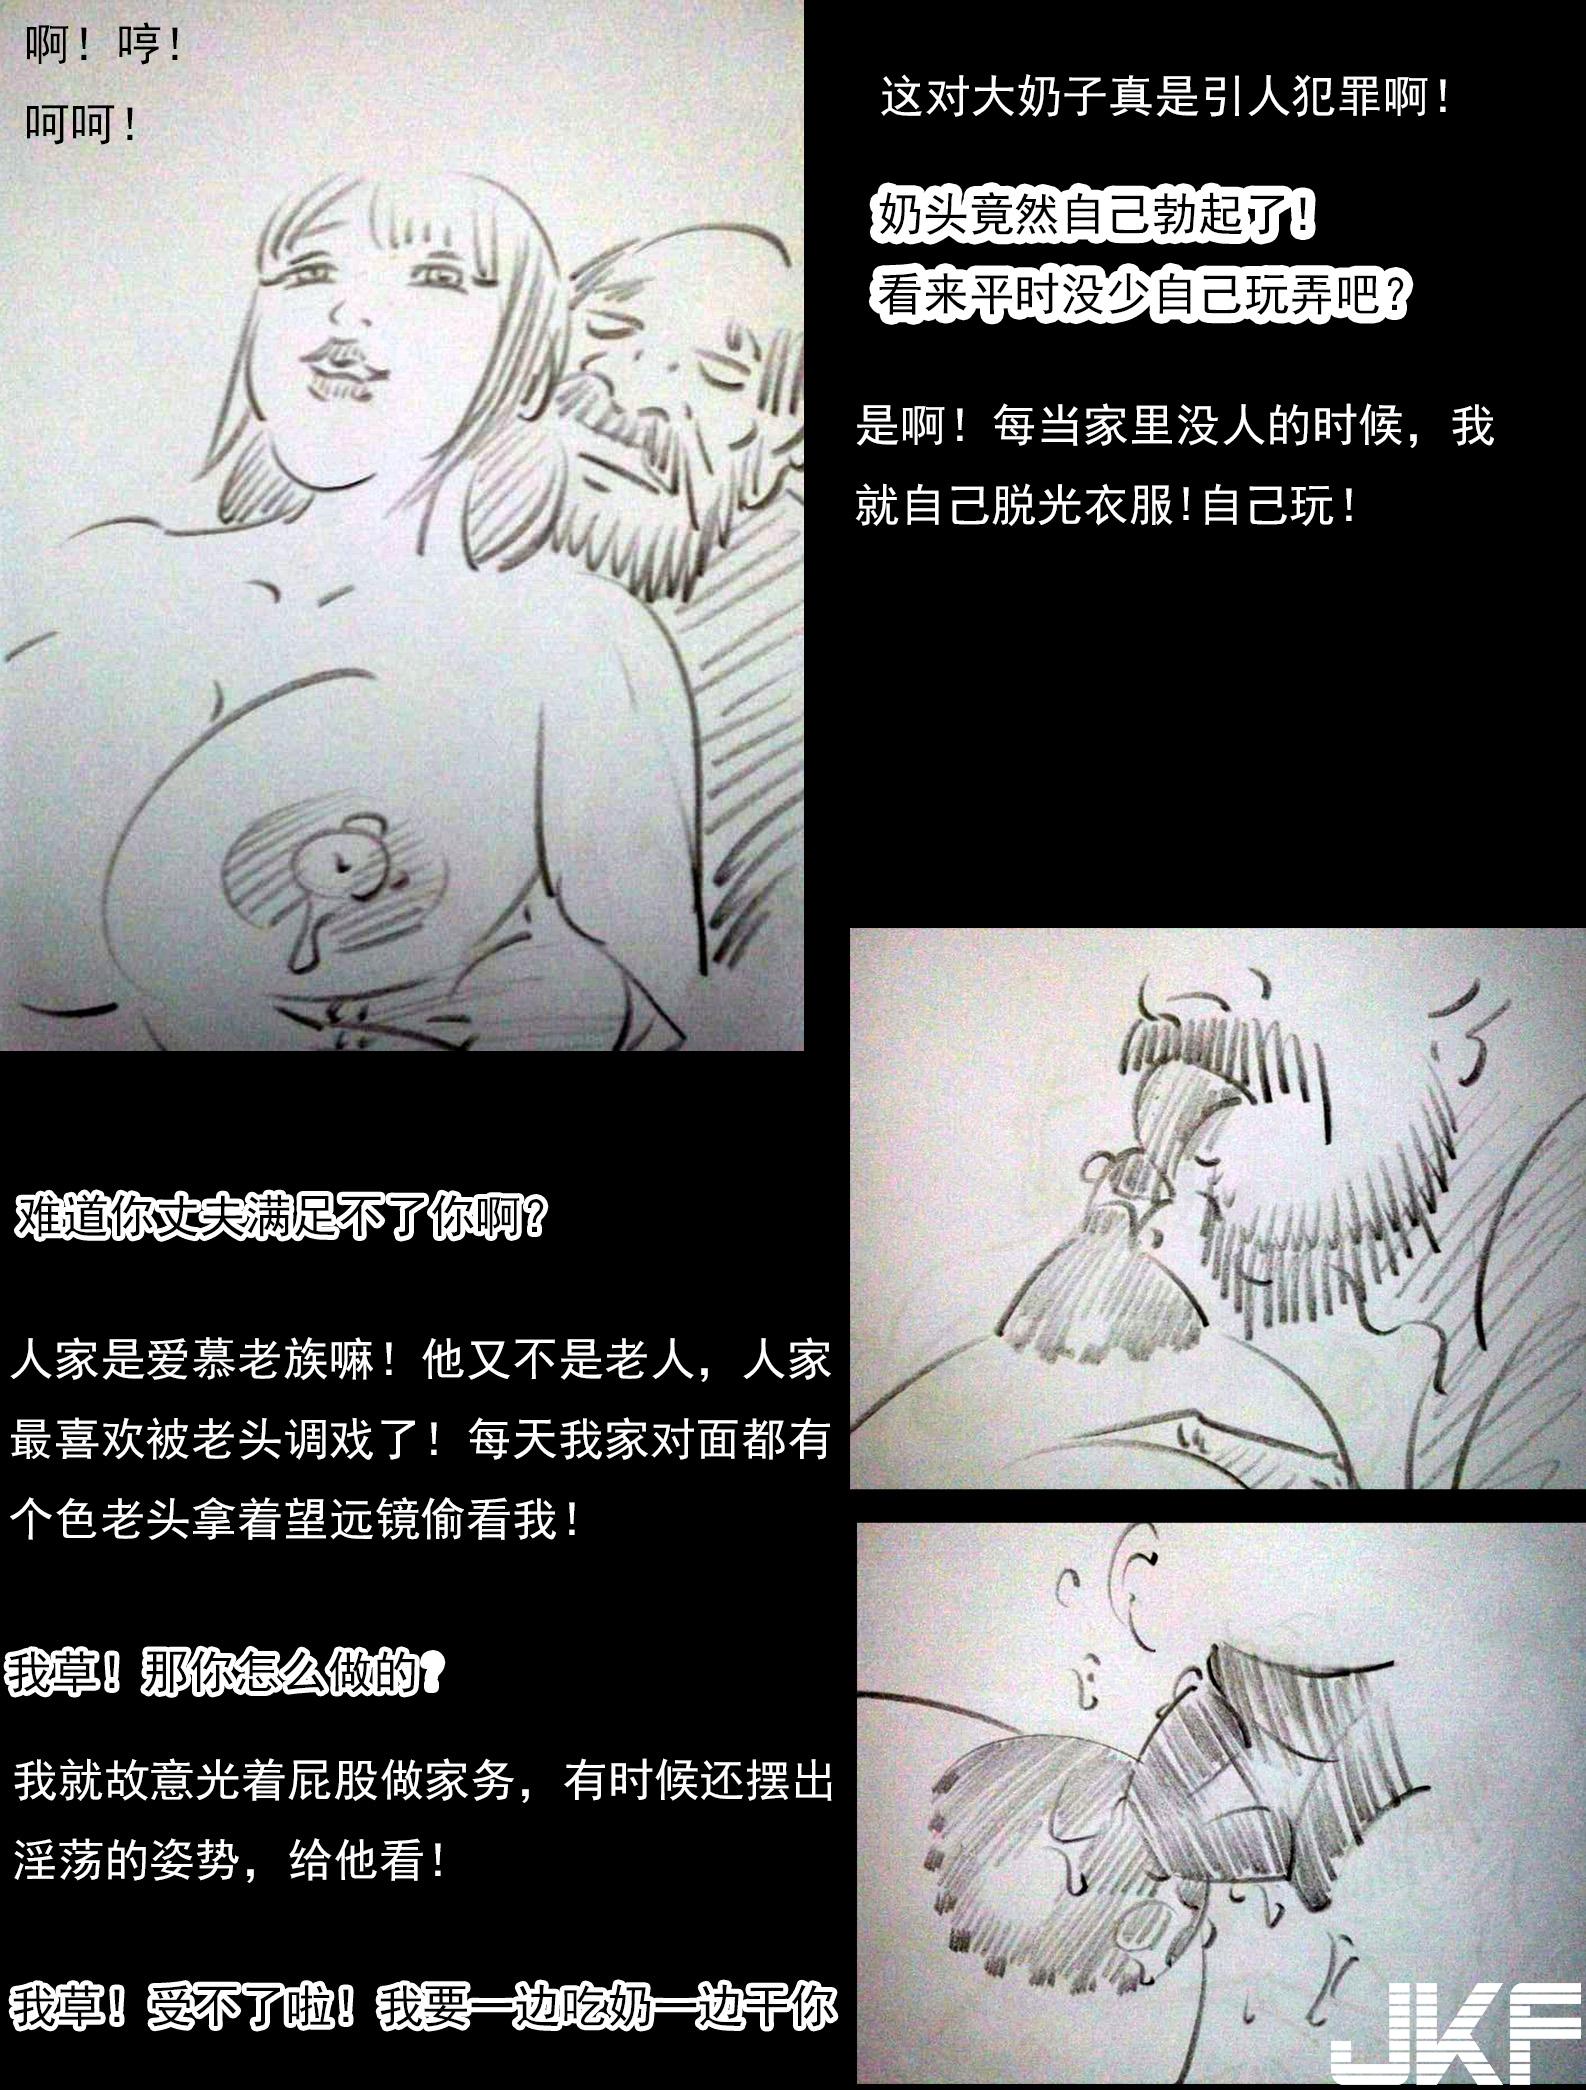 (pid-59781801)【夕阳欲孽】_p4.jpg